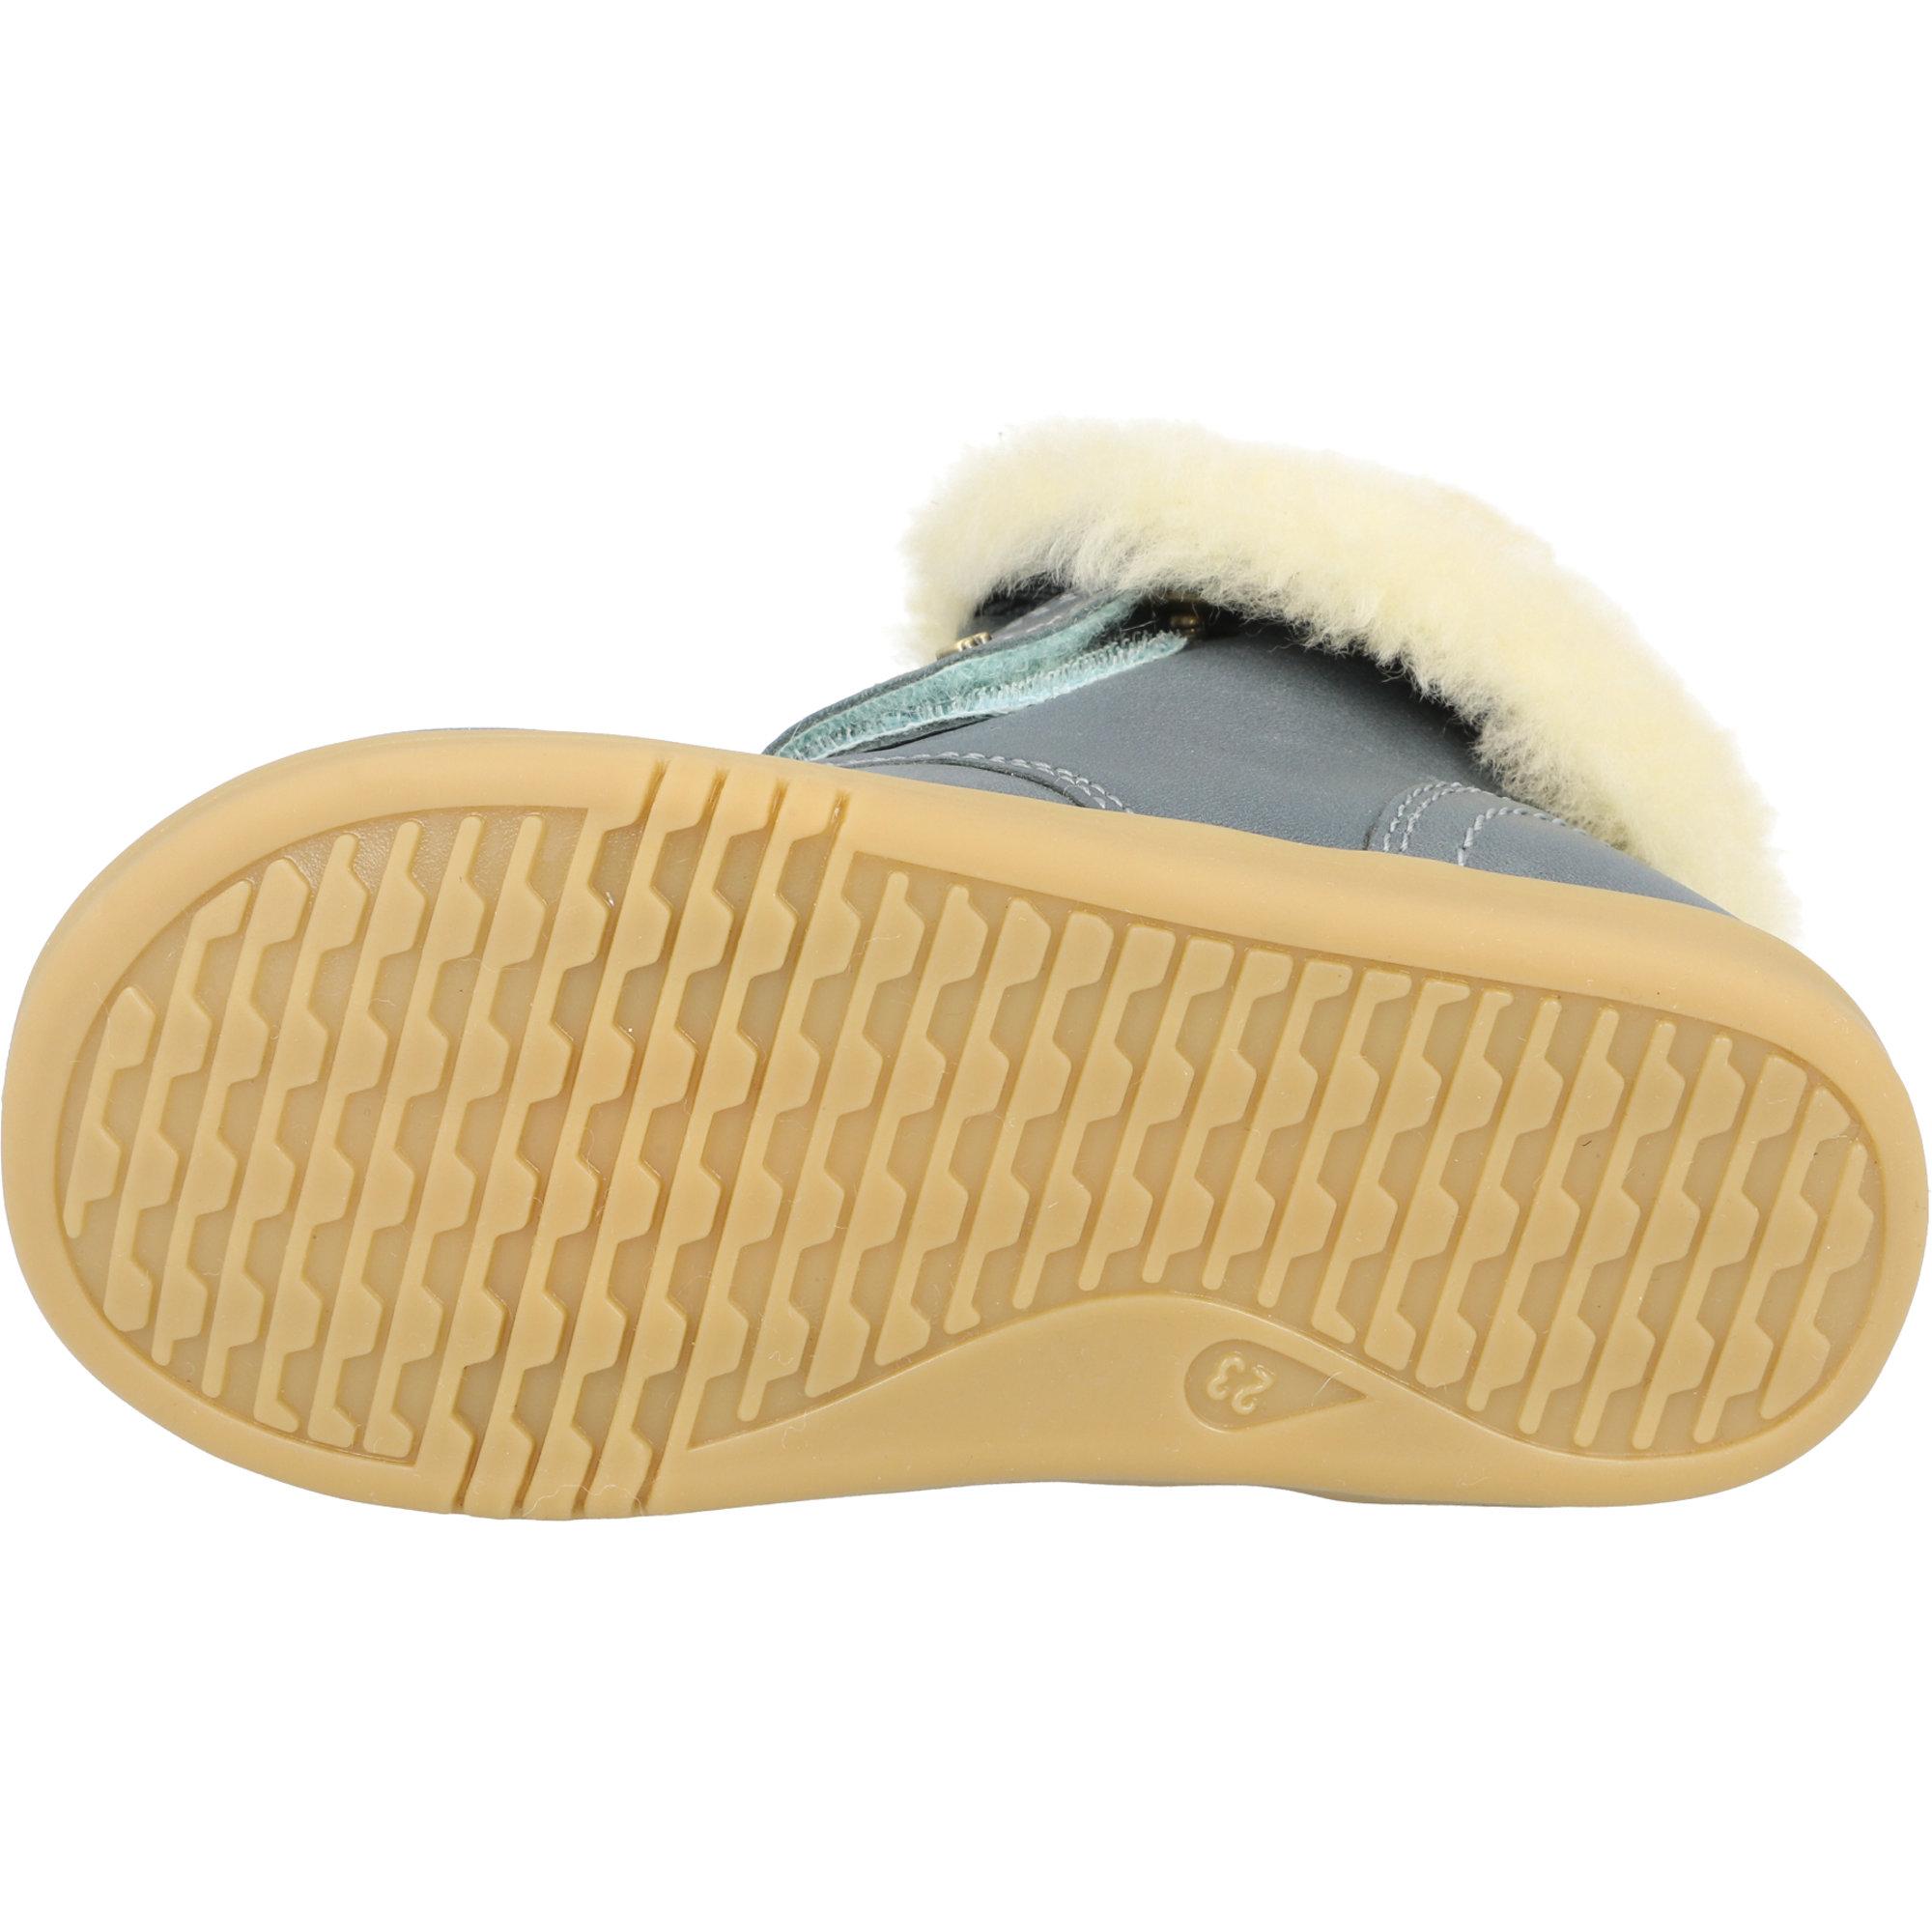 Bobux i-Walk Desert Arctic Slate Quickdry Vintage-Look Leather